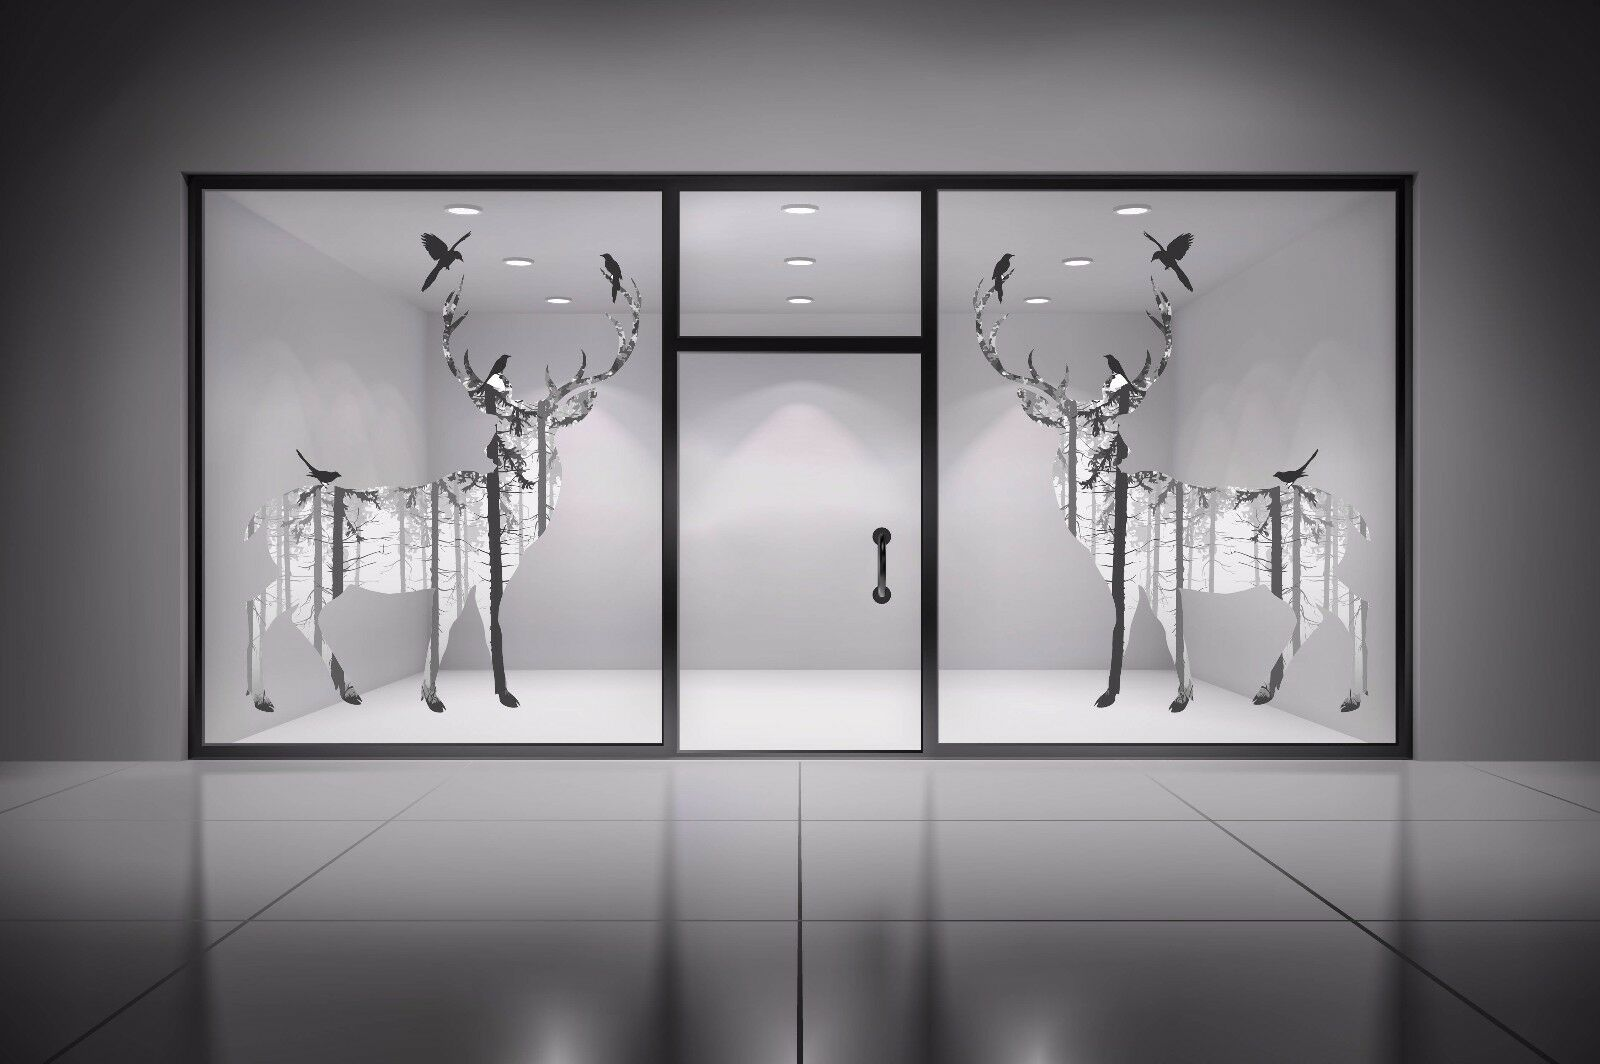 3D Sketch Deer 506 Wallpaper Murals Wall Print Wall Mural AJ WALL AU Summer